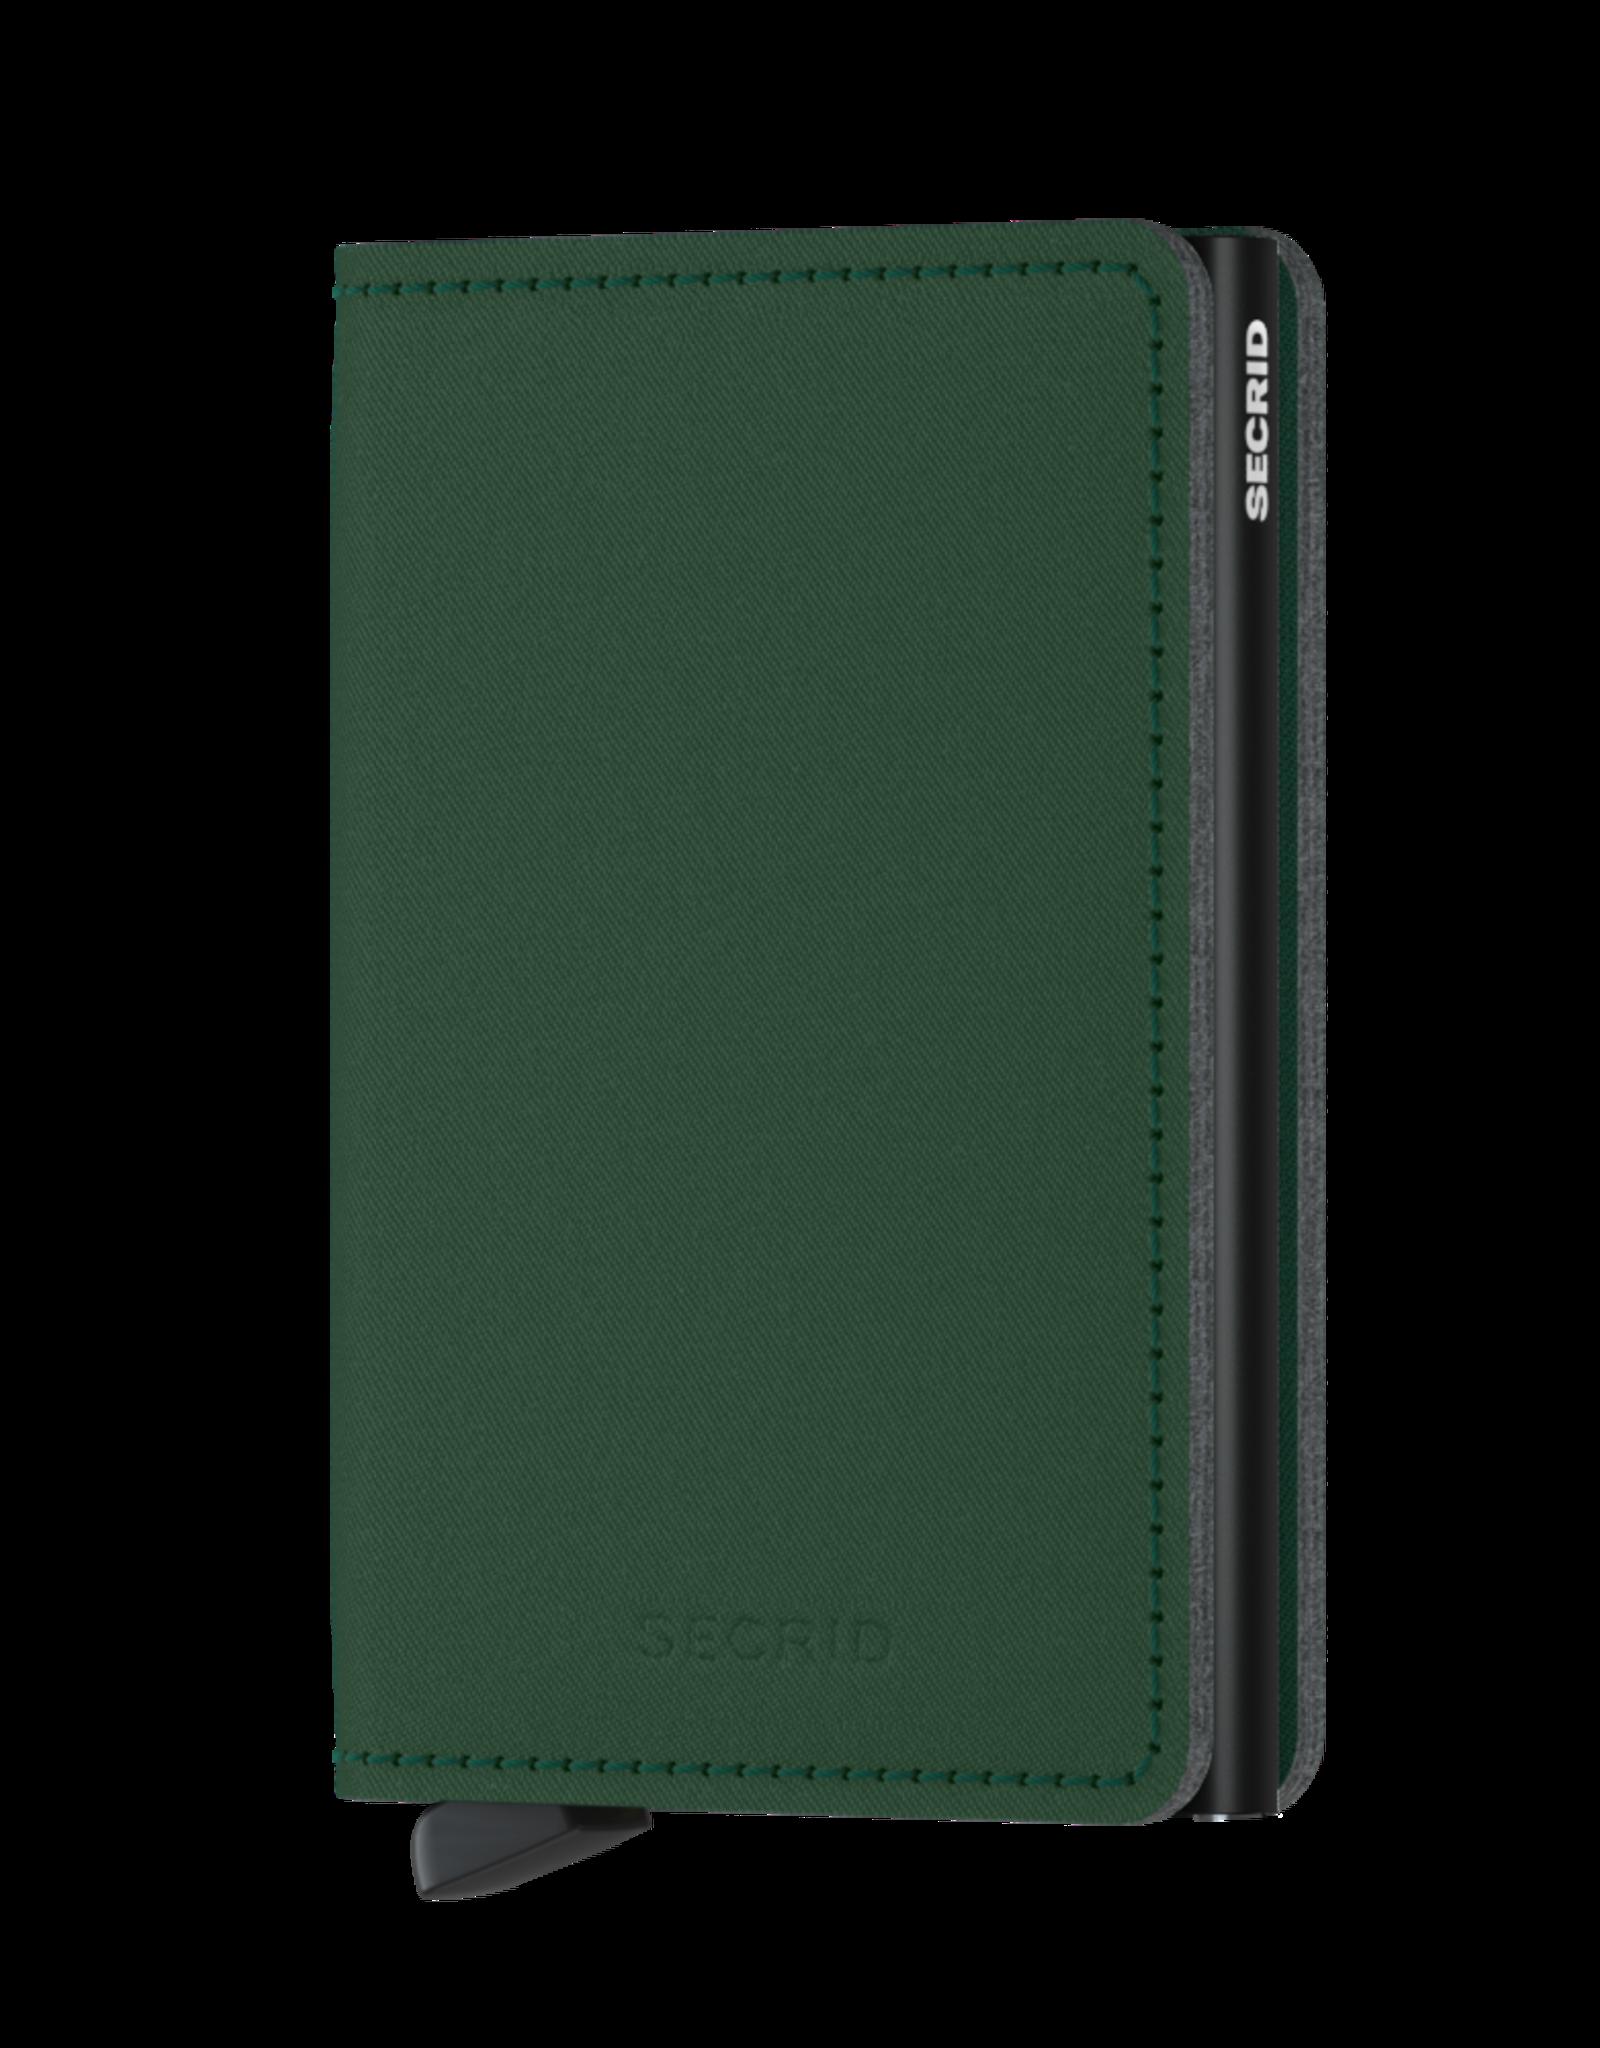 Secrid Slimwallet Yard Green (non-leather)